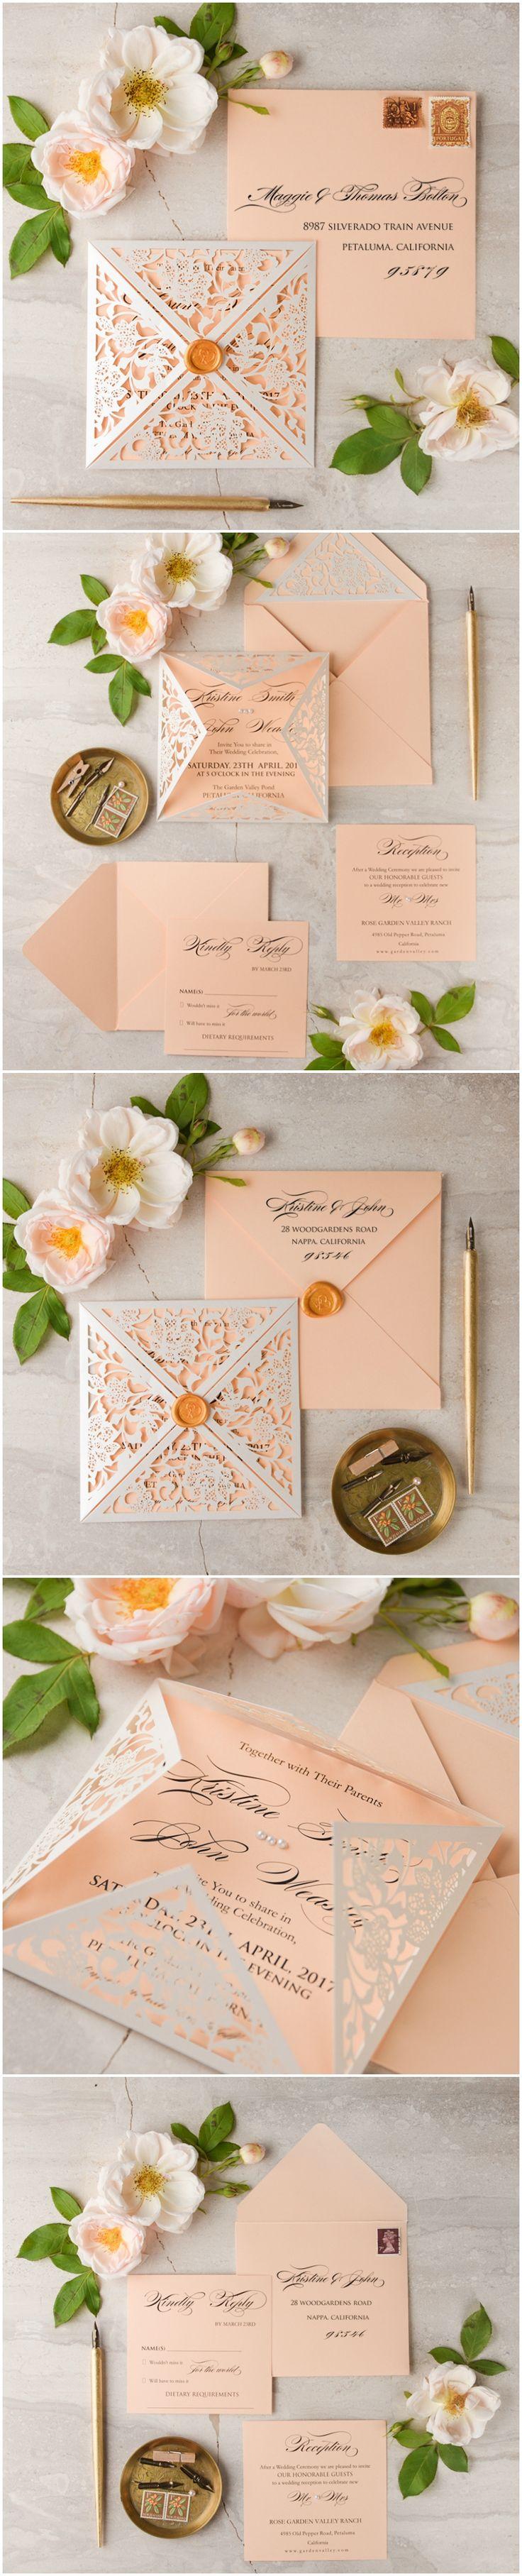 Best 20+ Cricut Wedding Invitations Ideas On Pinterest | Cricut Wedding,  Cricut Invitations And Blush Wedding Invitations